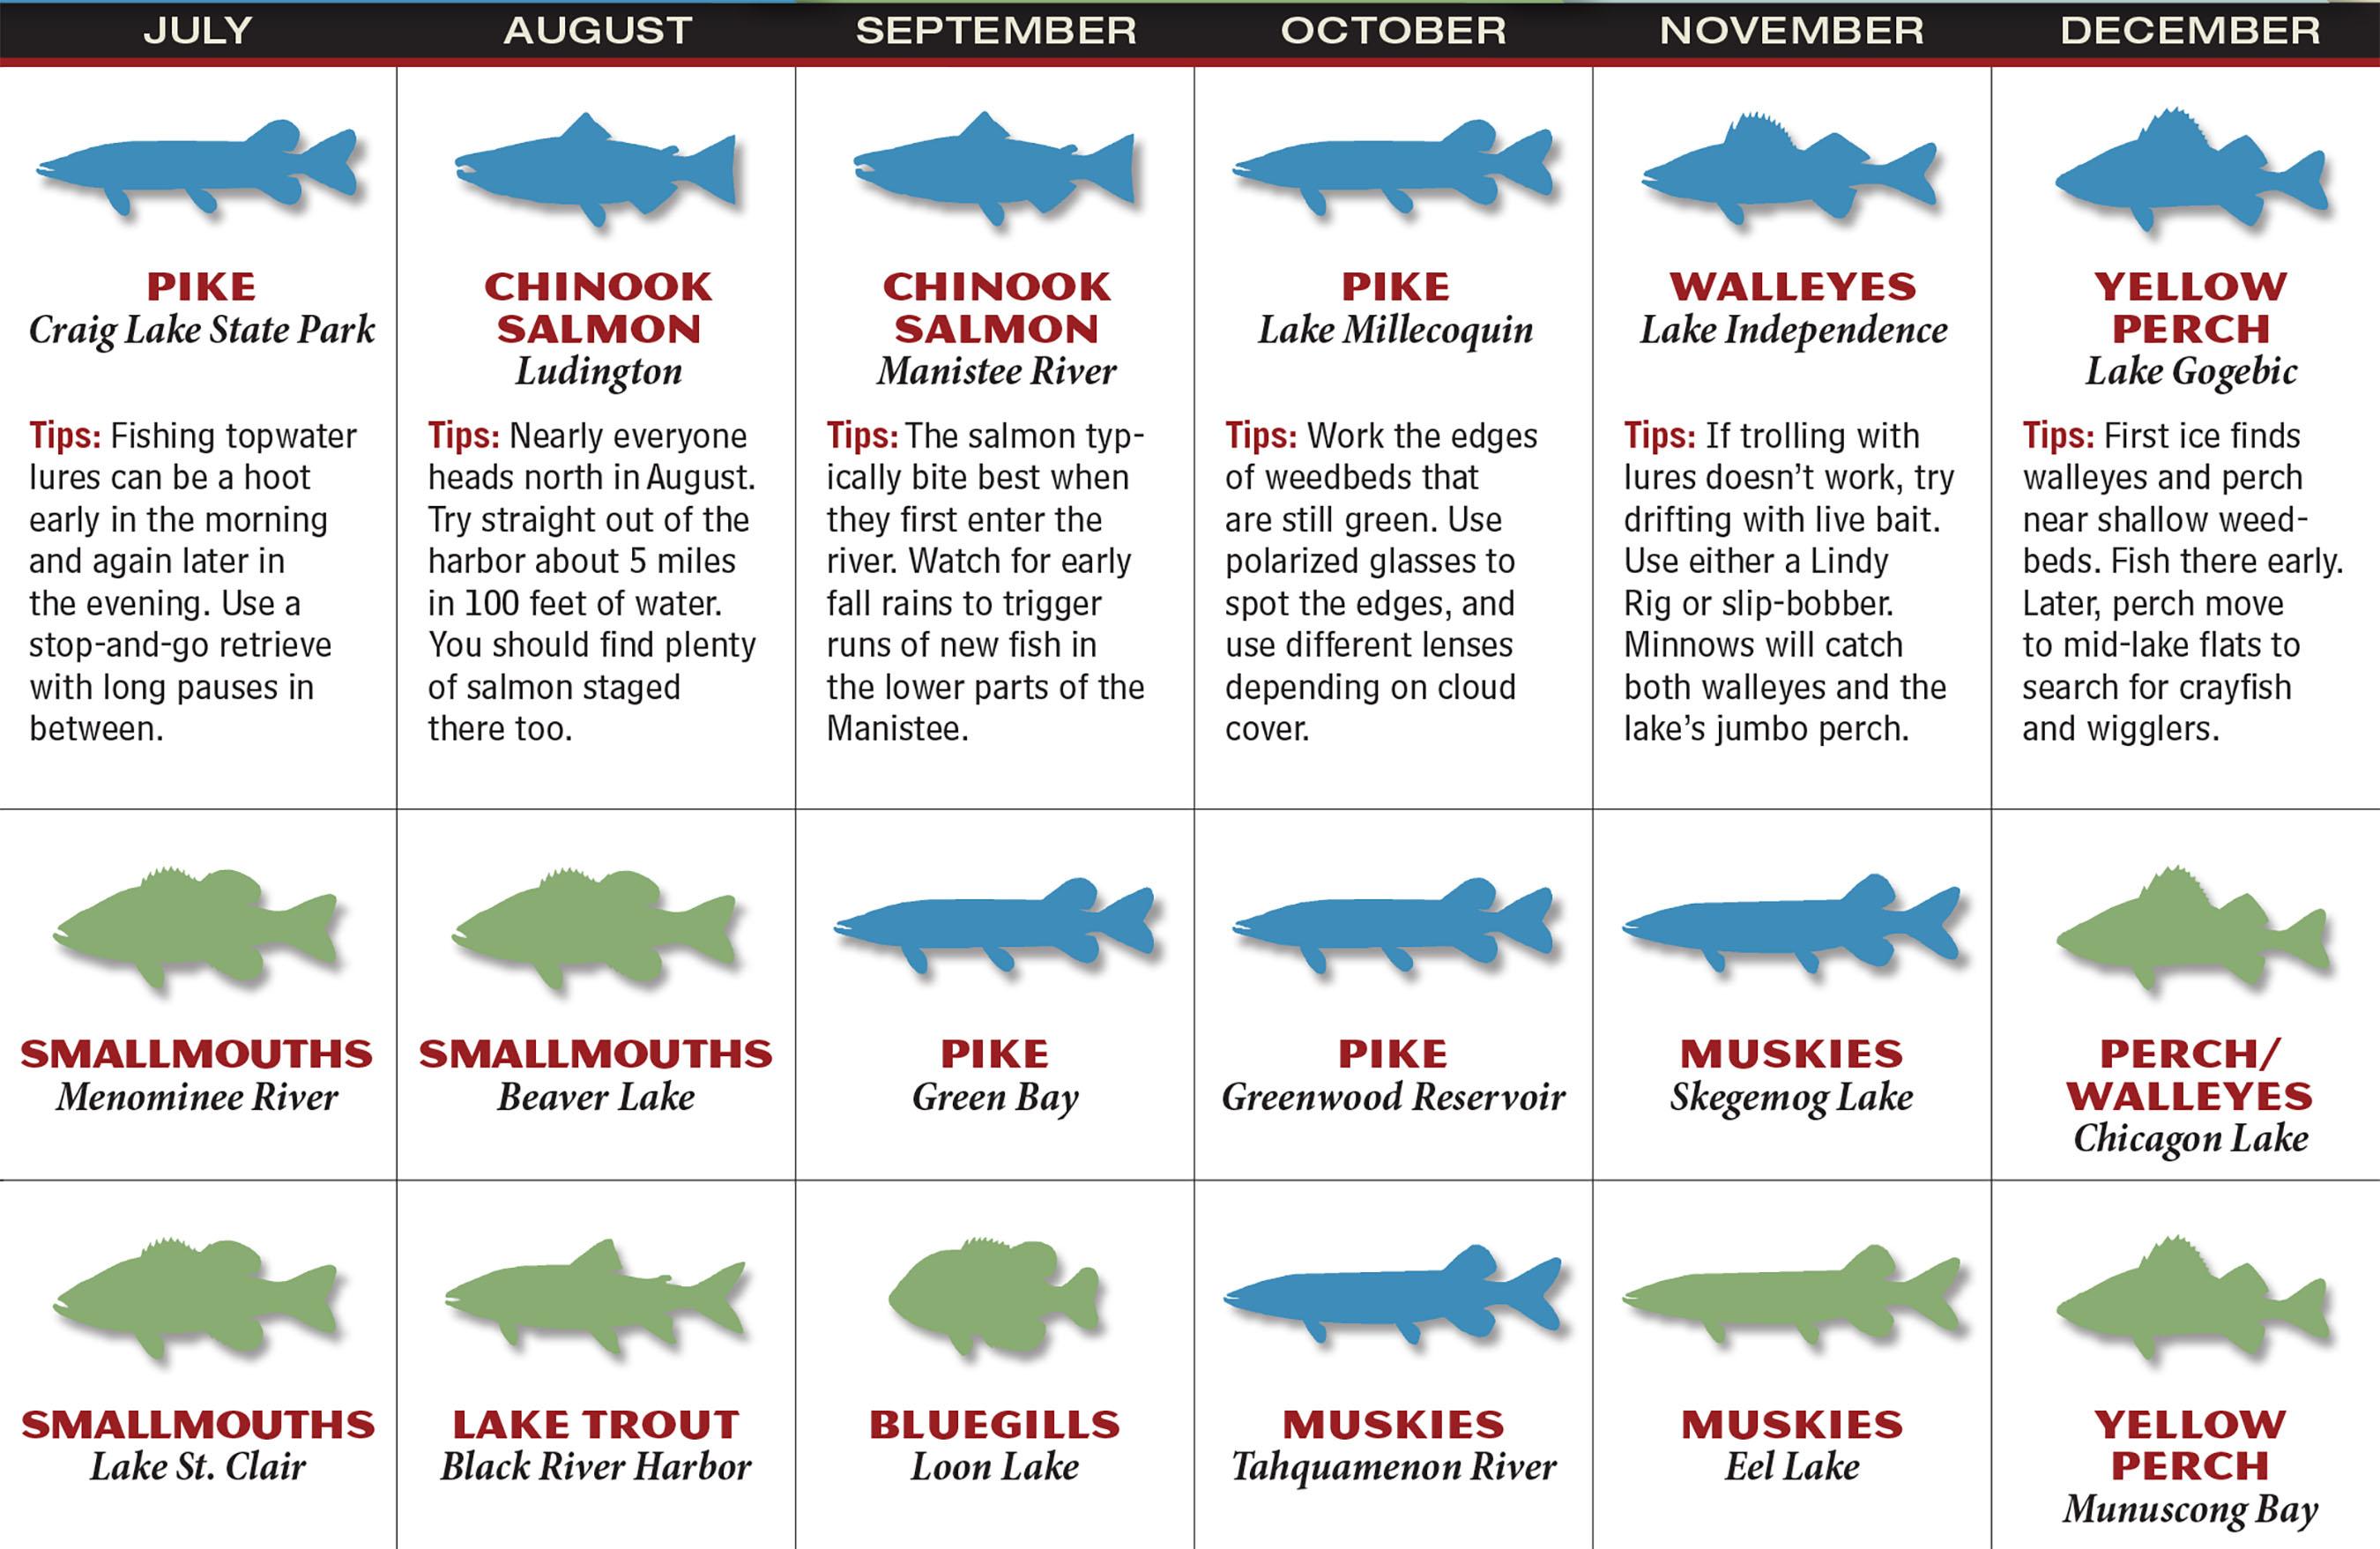 2017 michigan fishing forecast game fish for Fishing forecast calendar